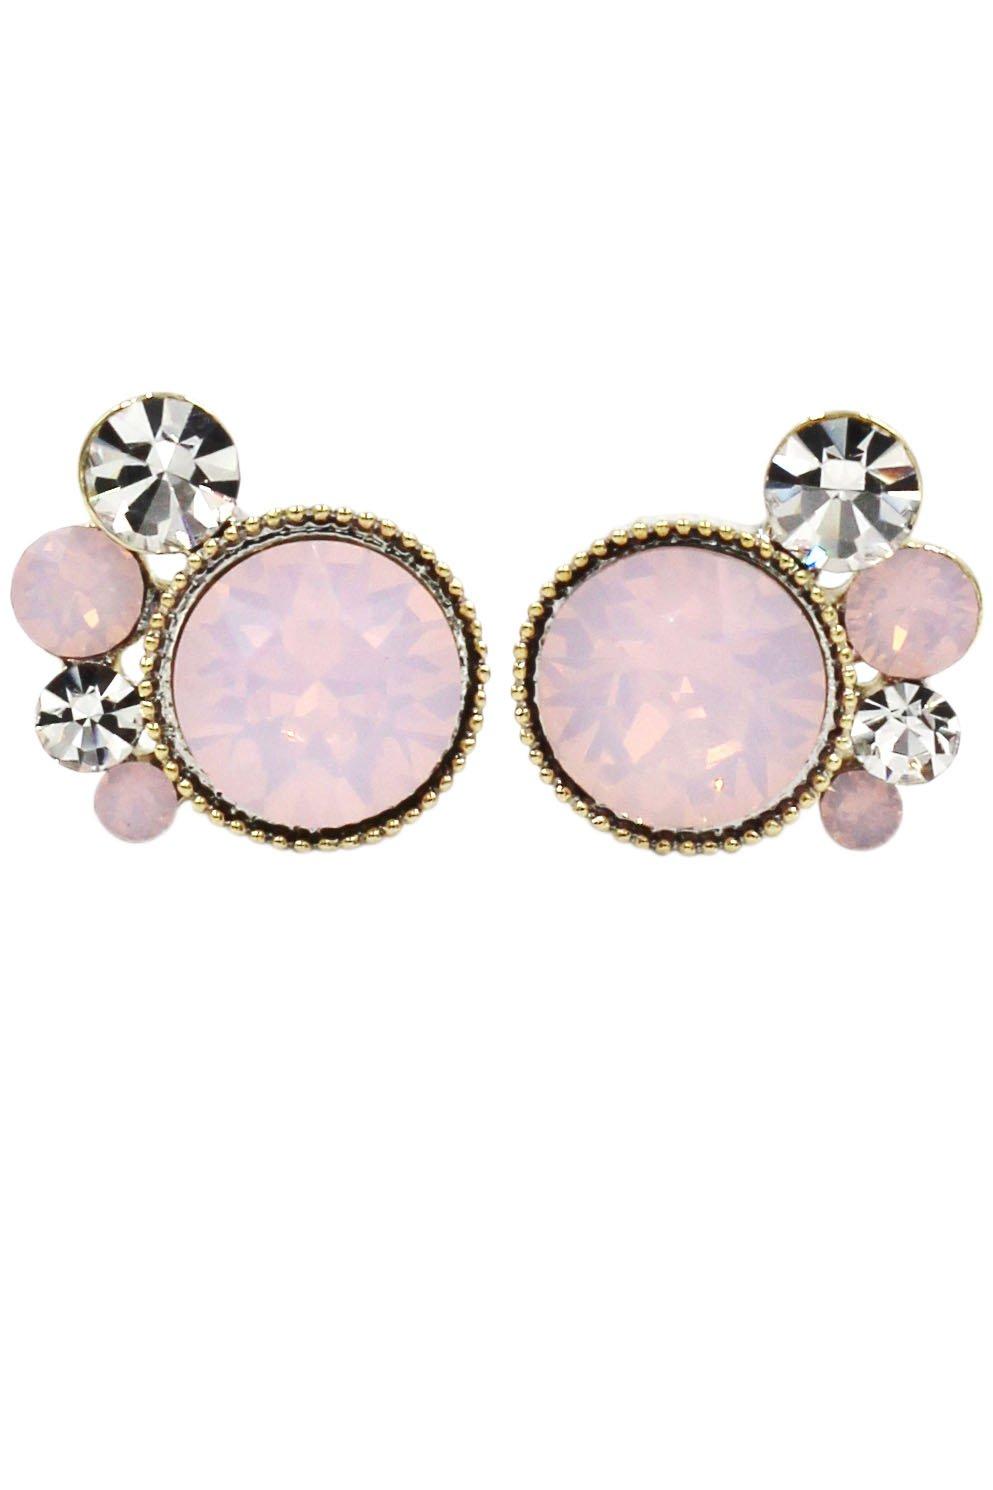 Lovely pink crystal little feet earrings